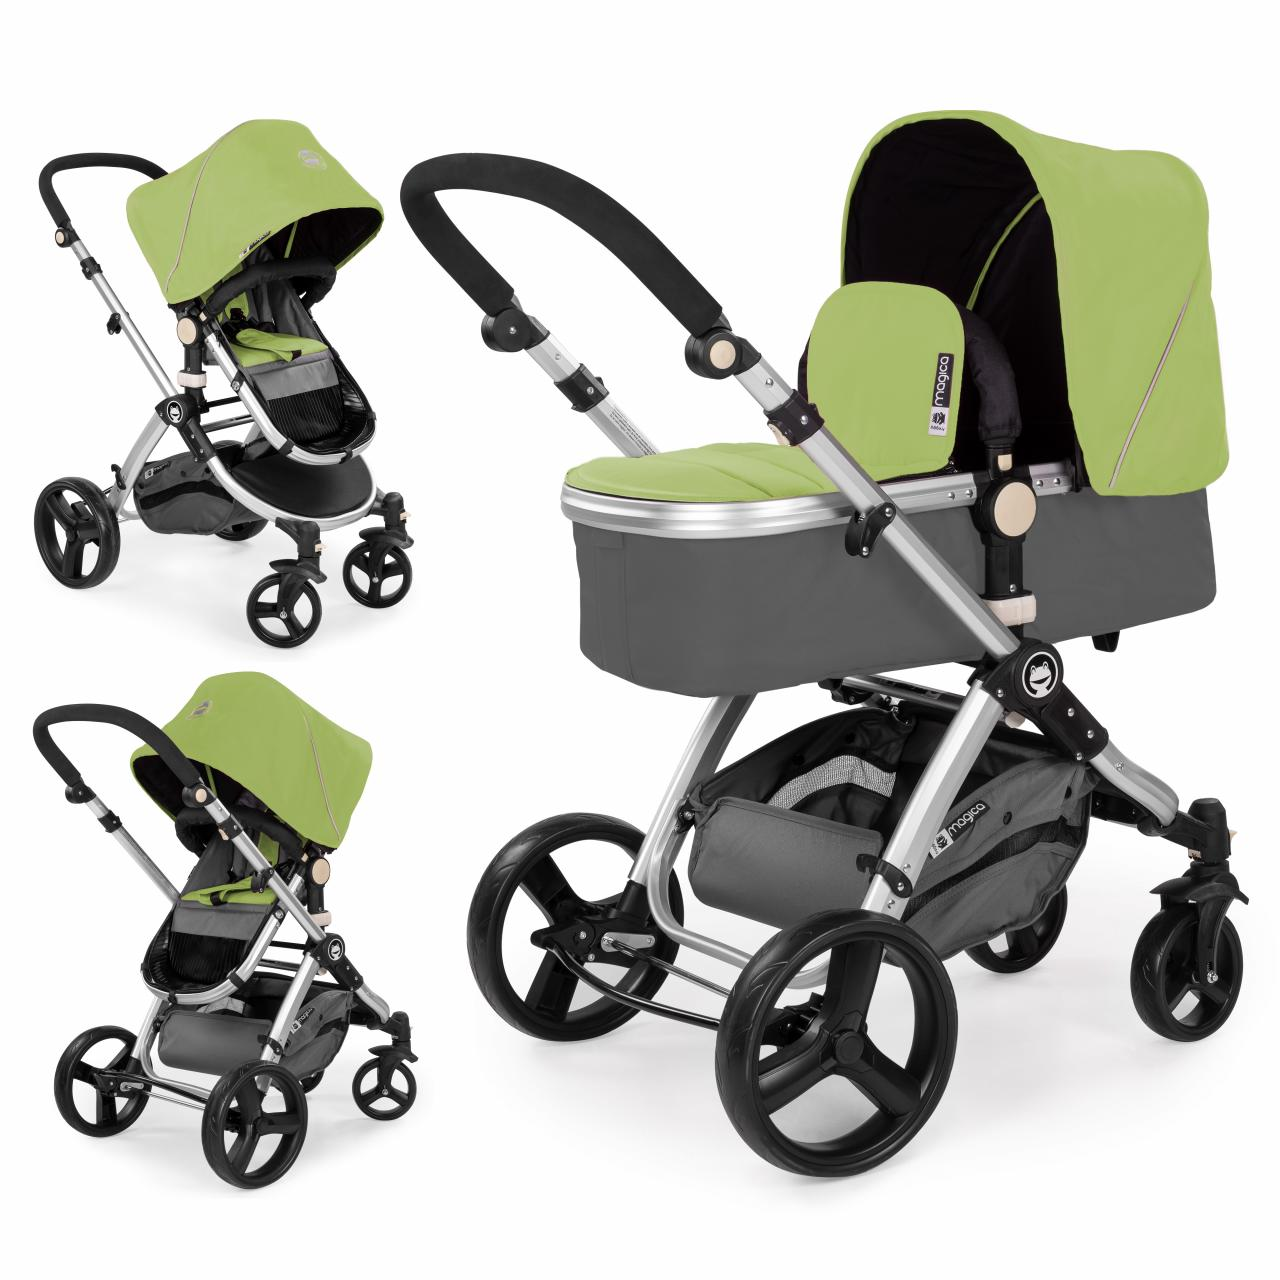 froggy kombikinderwagen sportwagen buggy kinderwagen magica design baby ebay. Black Bedroom Furniture Sets. Home Design Ideas